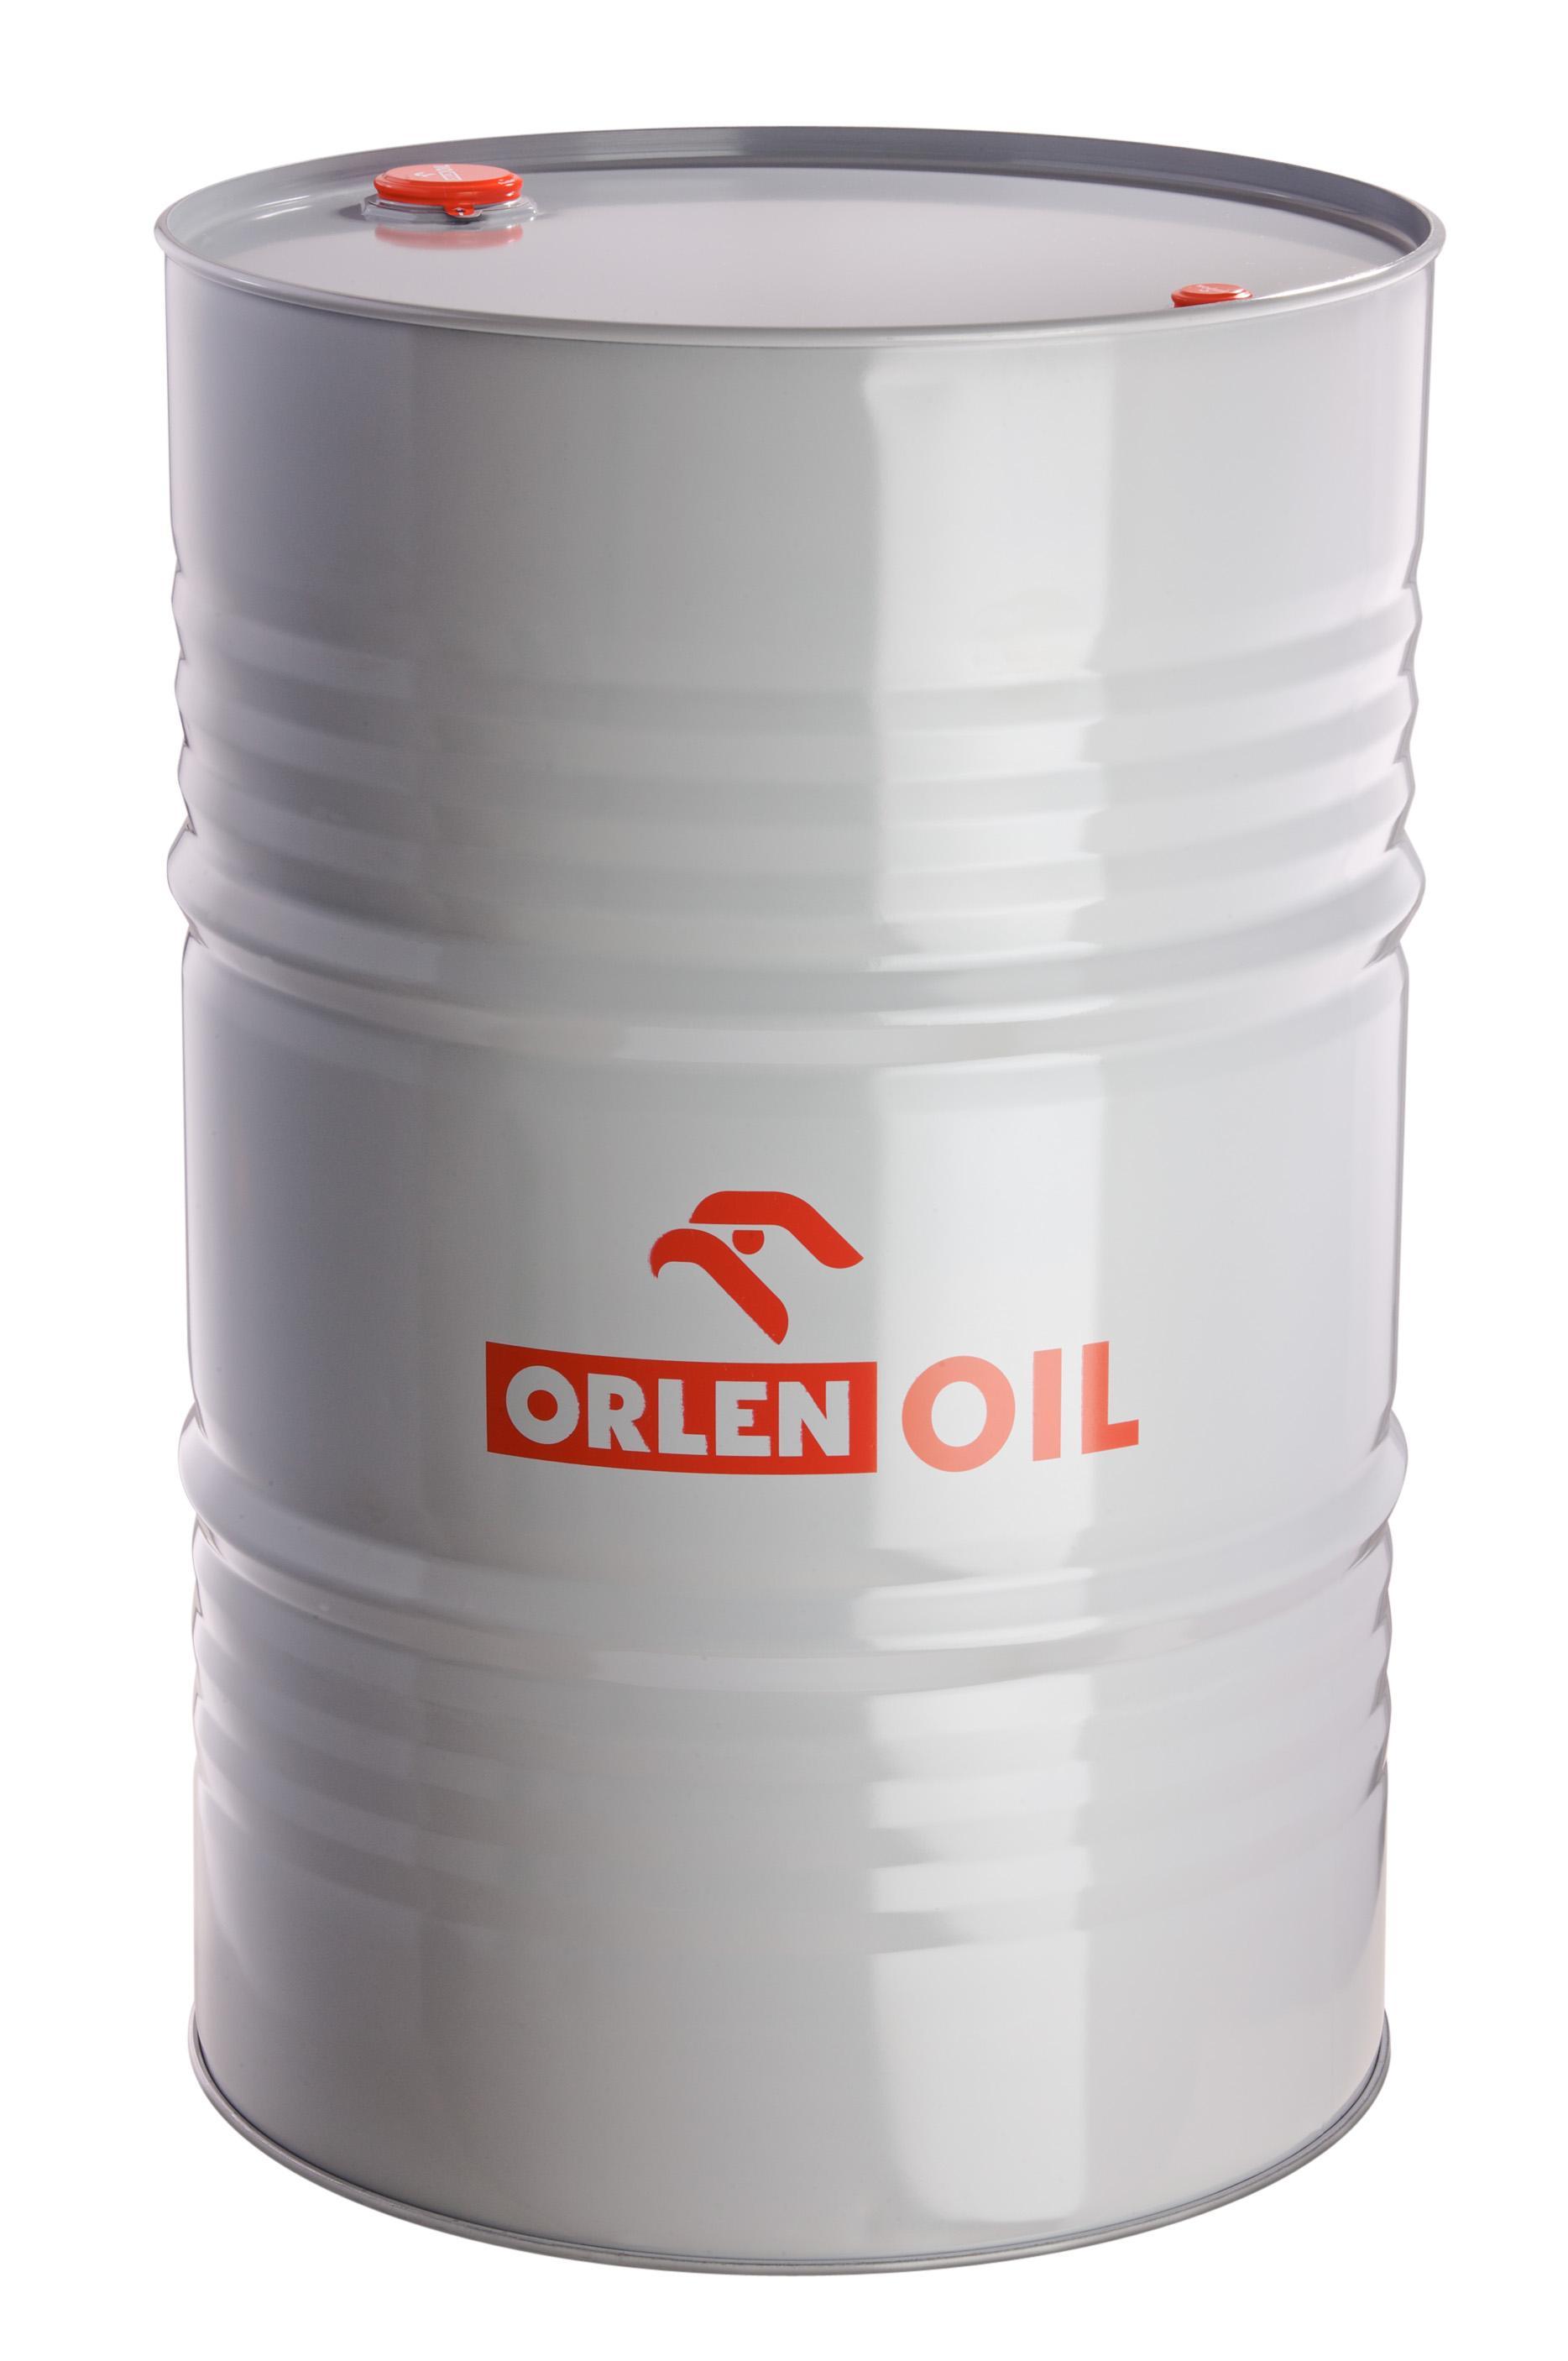 ORLEN OIL ITERM 6 MB      BECZKA 205L